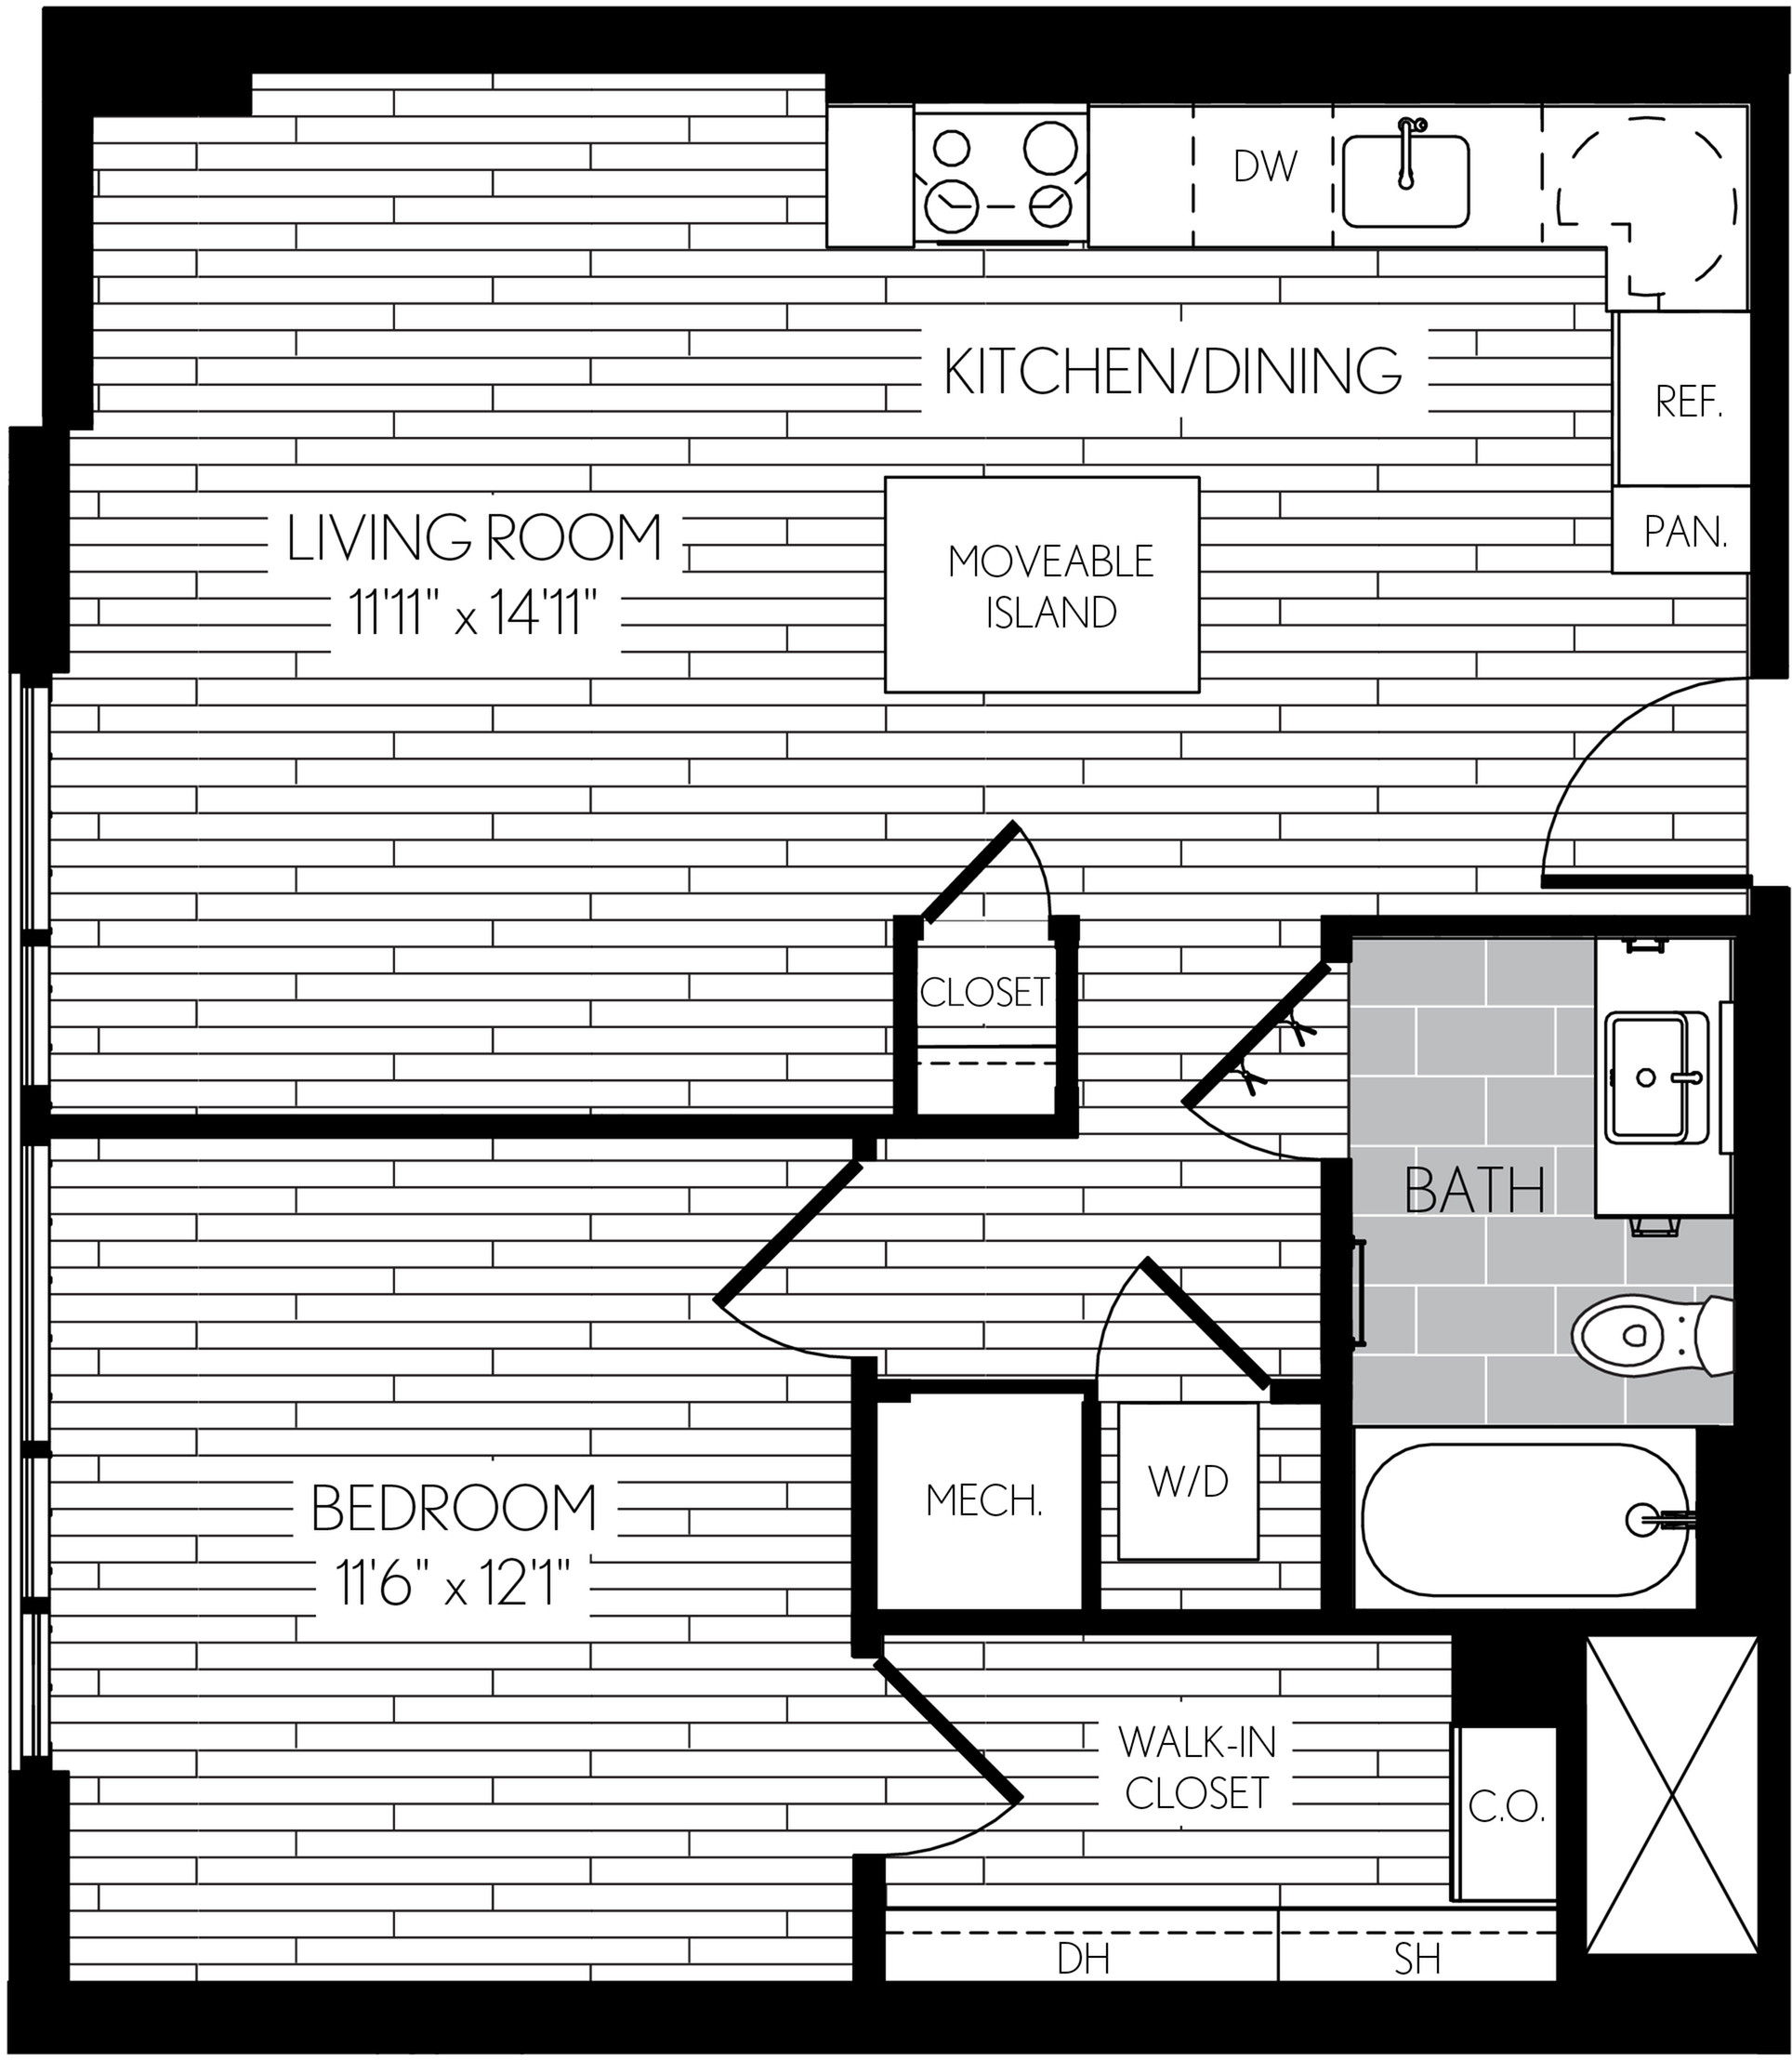 663 square foot one bedroom one bath apartment floorplan image